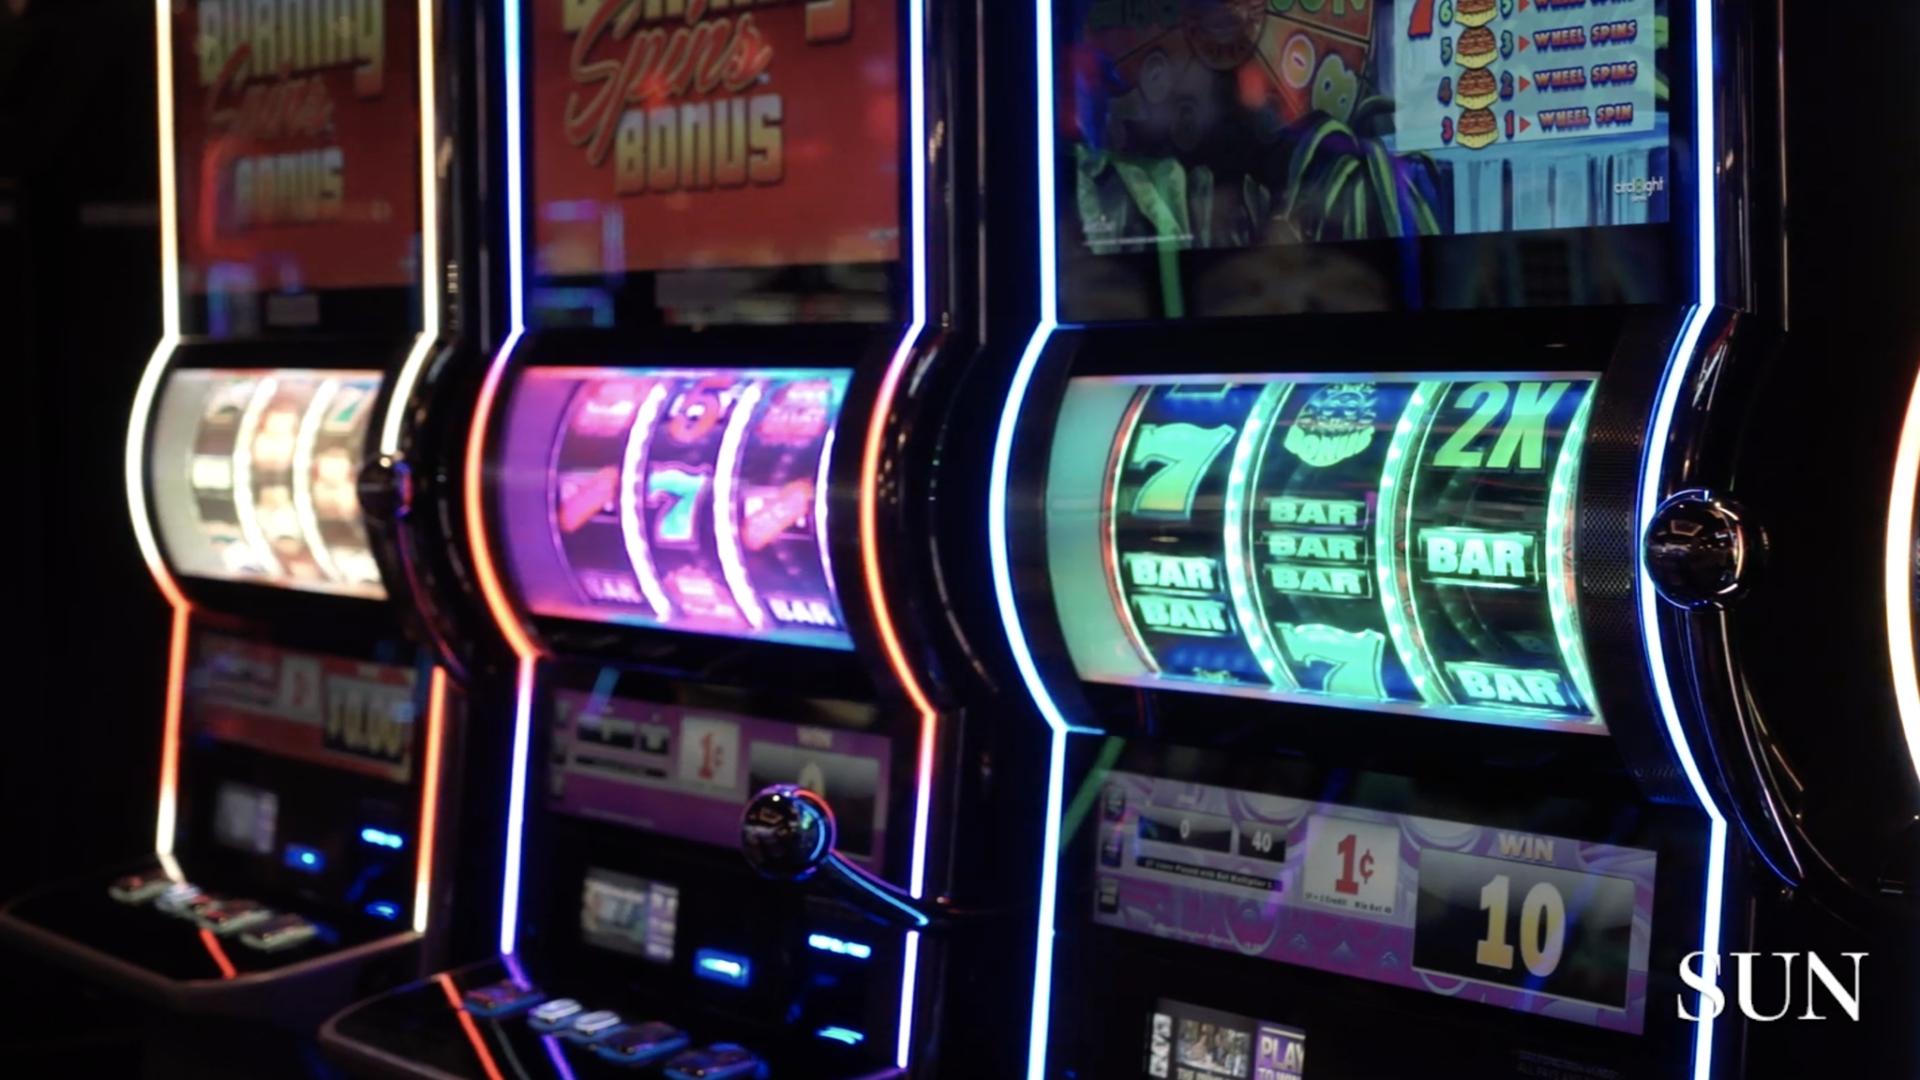 Cordish casino arundel mills